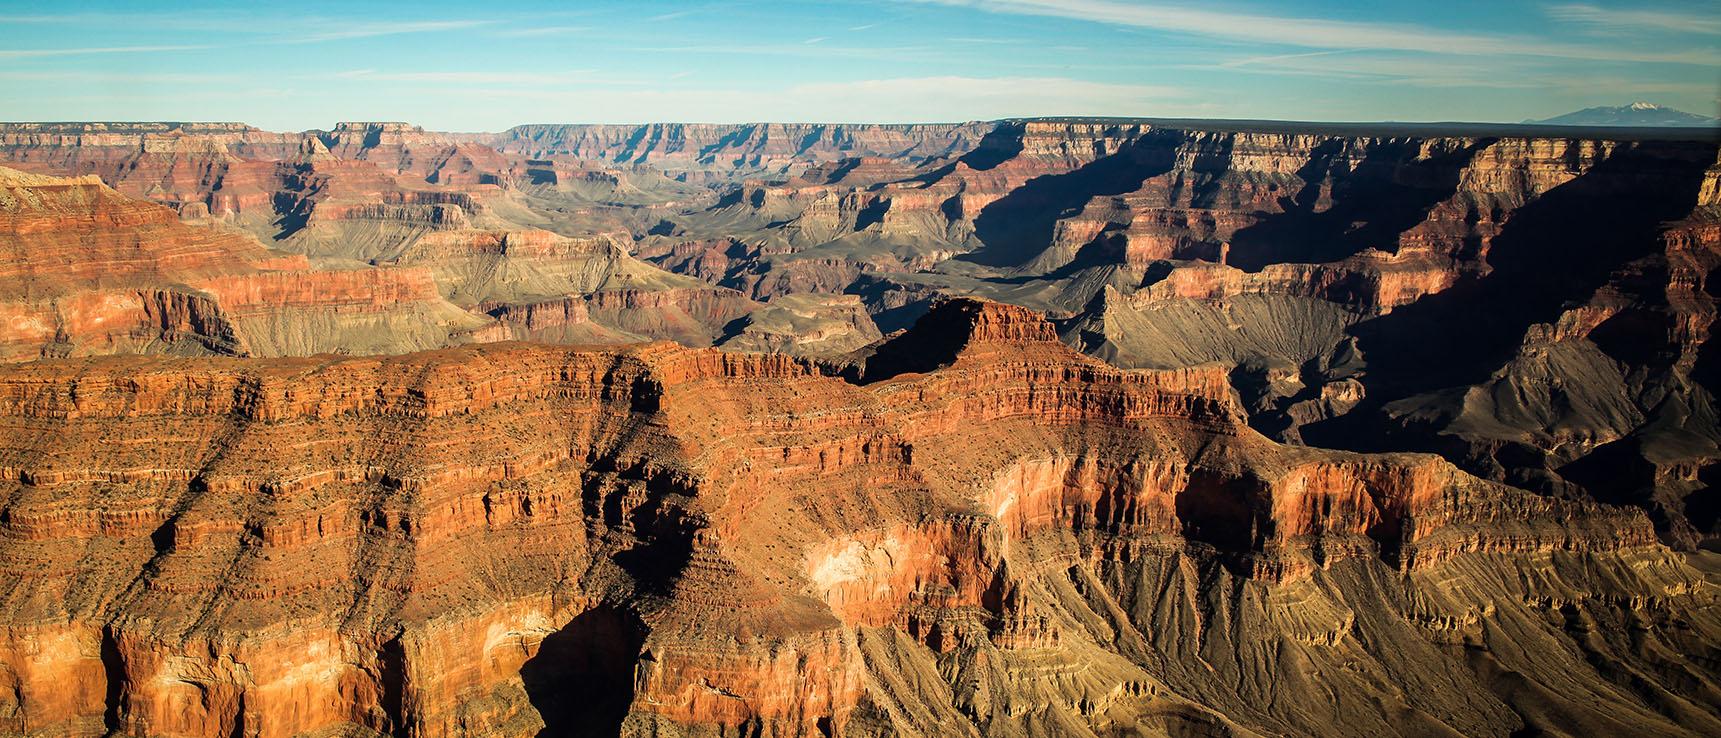 Grand Canyon National Park Arizona USA Road trip helicoptere